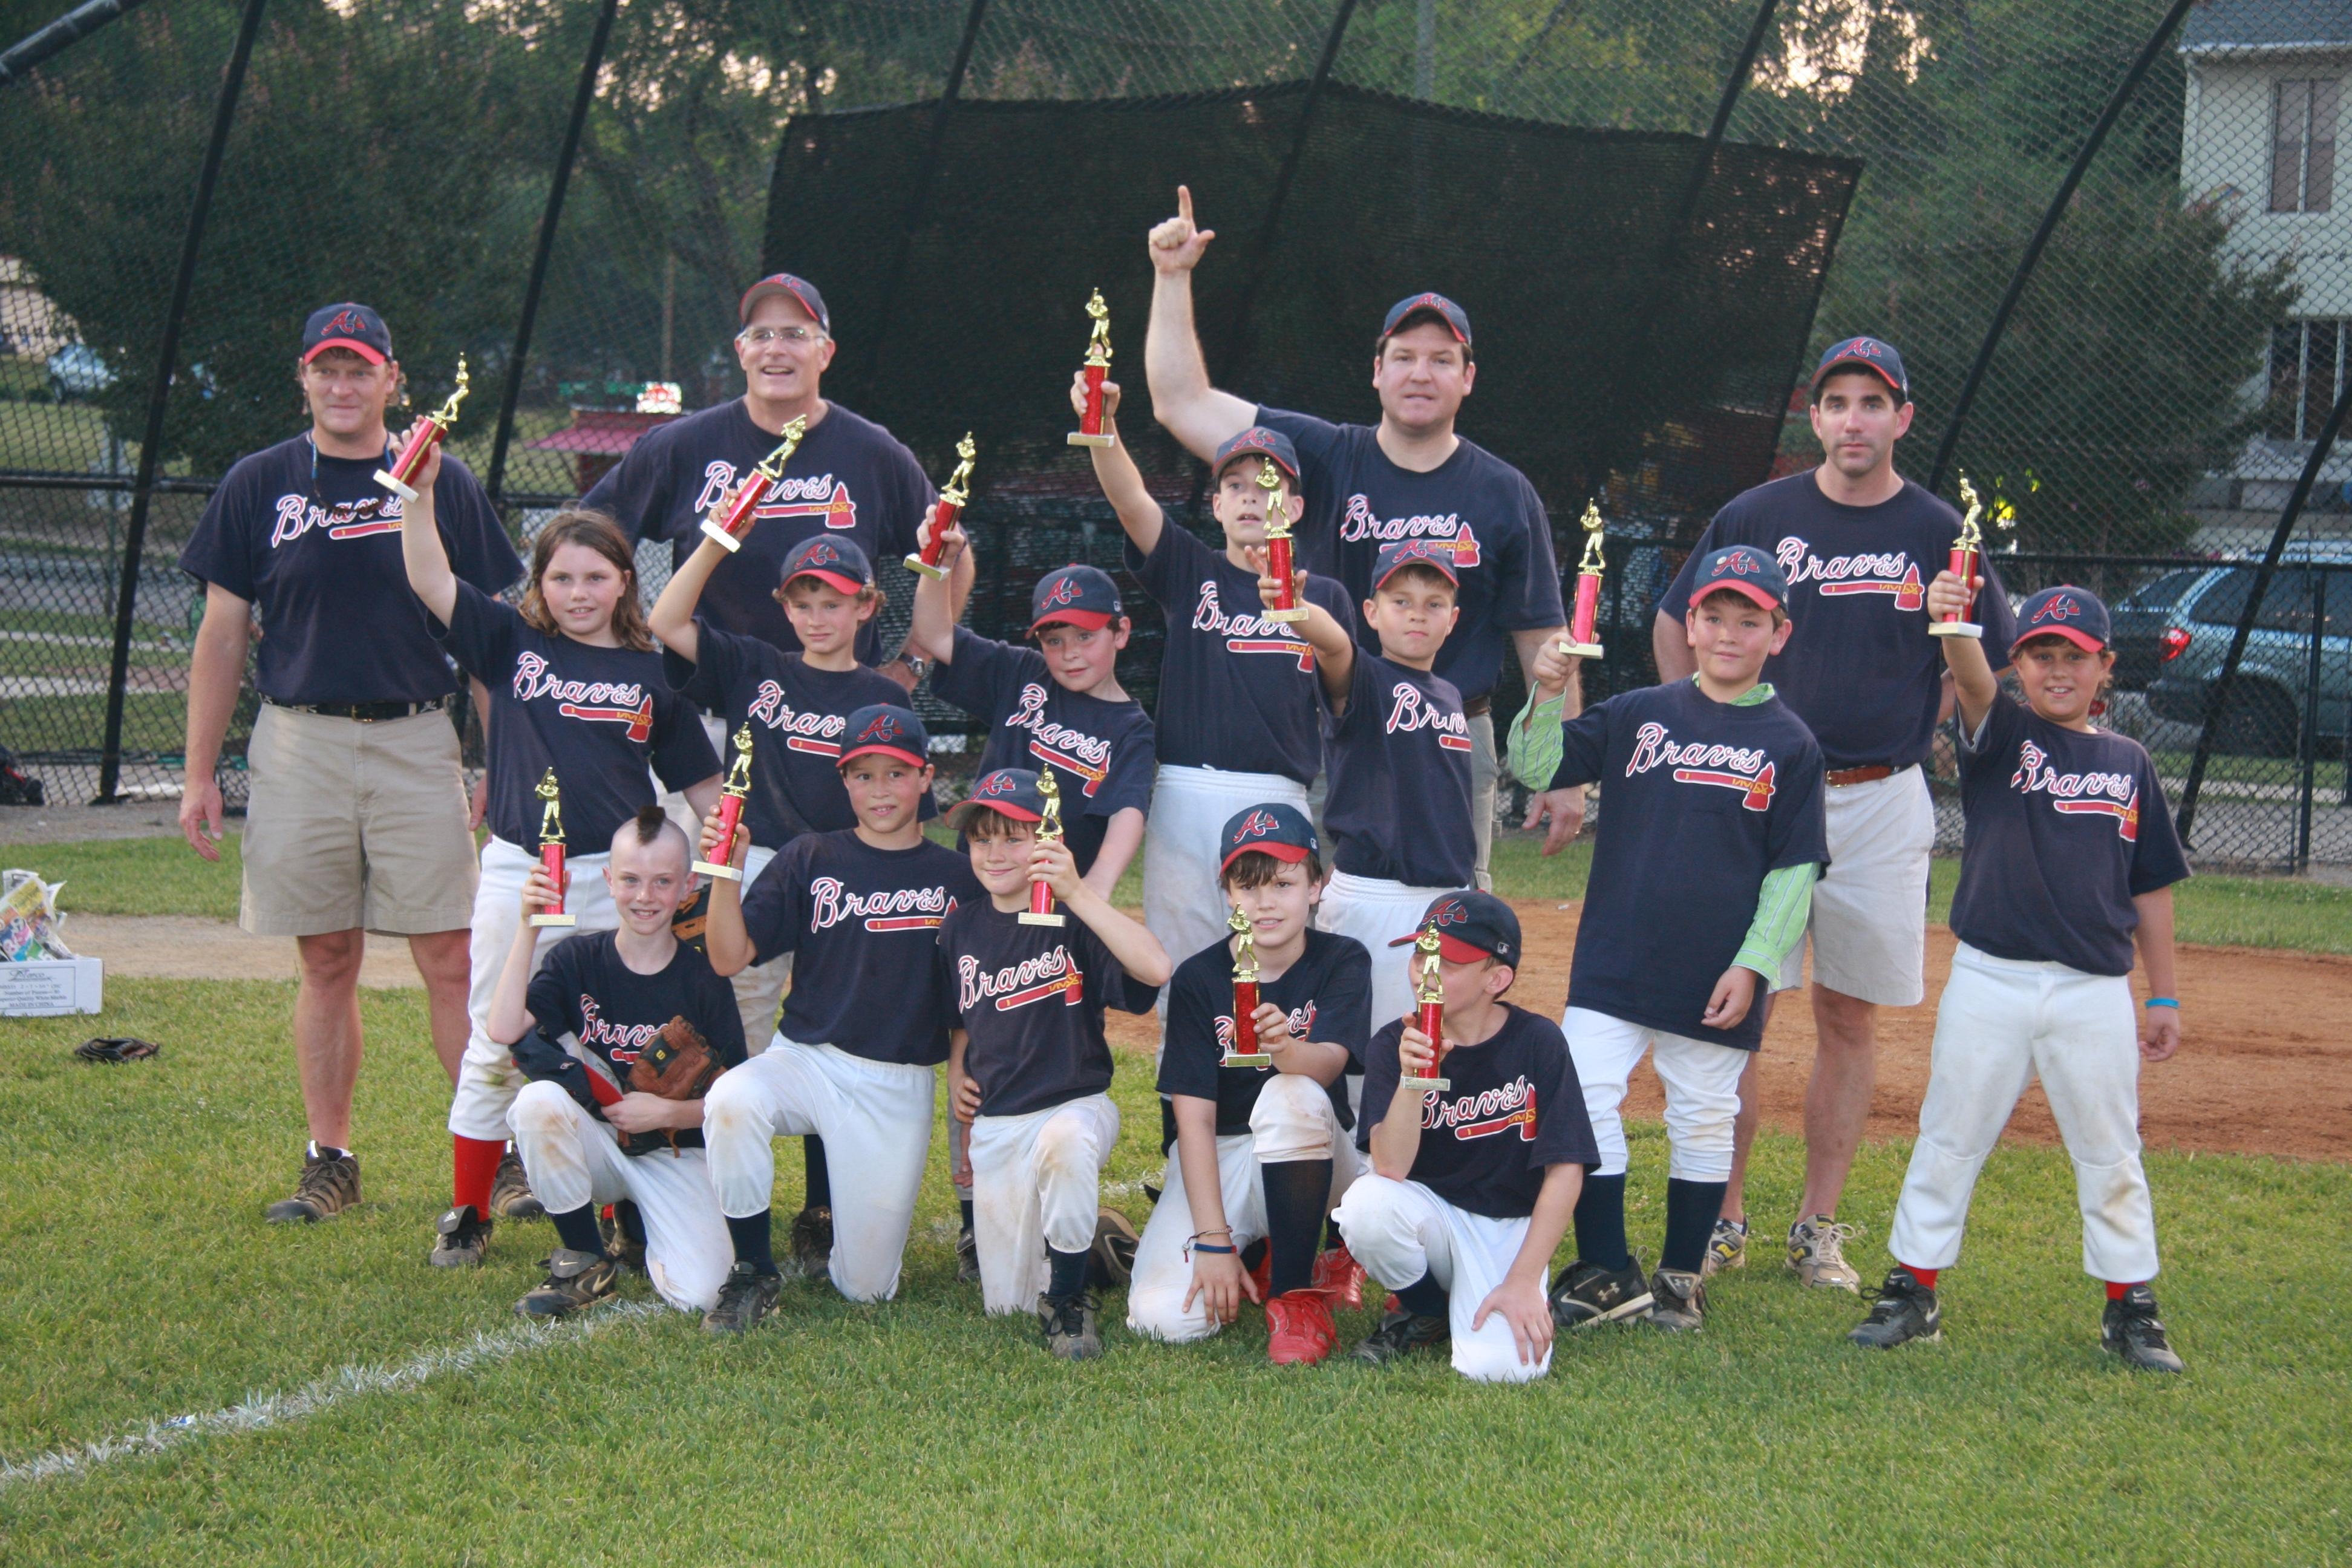 Minors Champions - Braves